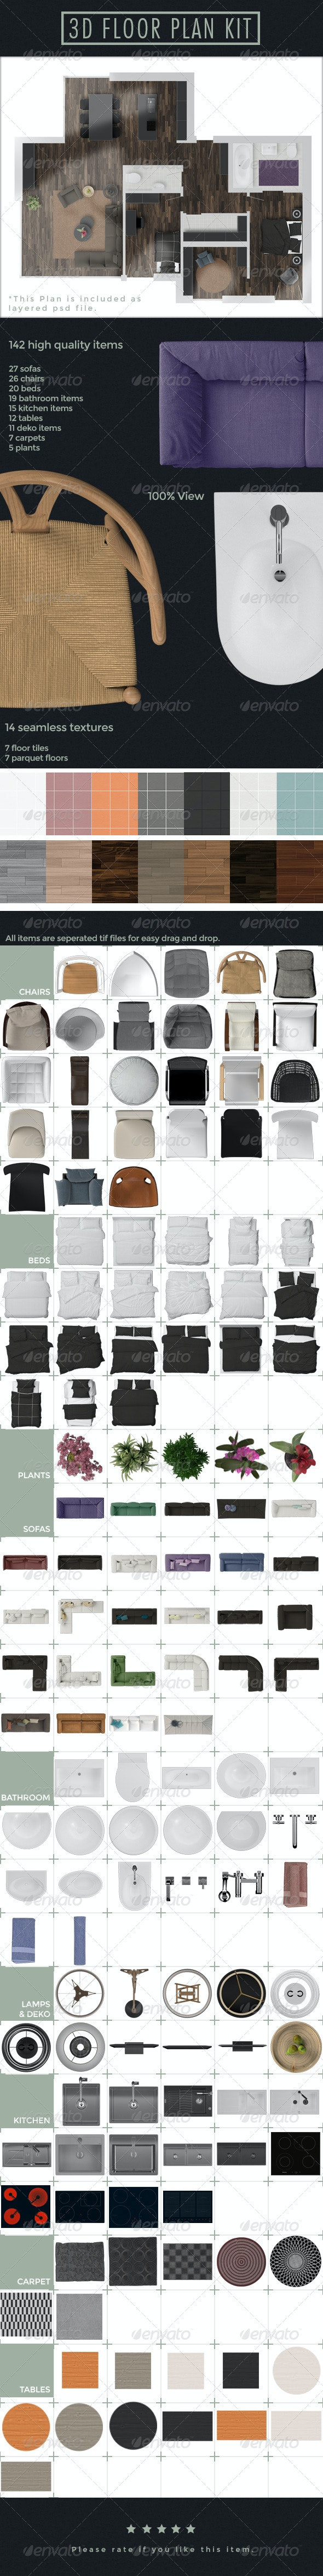 3D Floor Plan Kit - Miscellaneous Product Mock-Ups